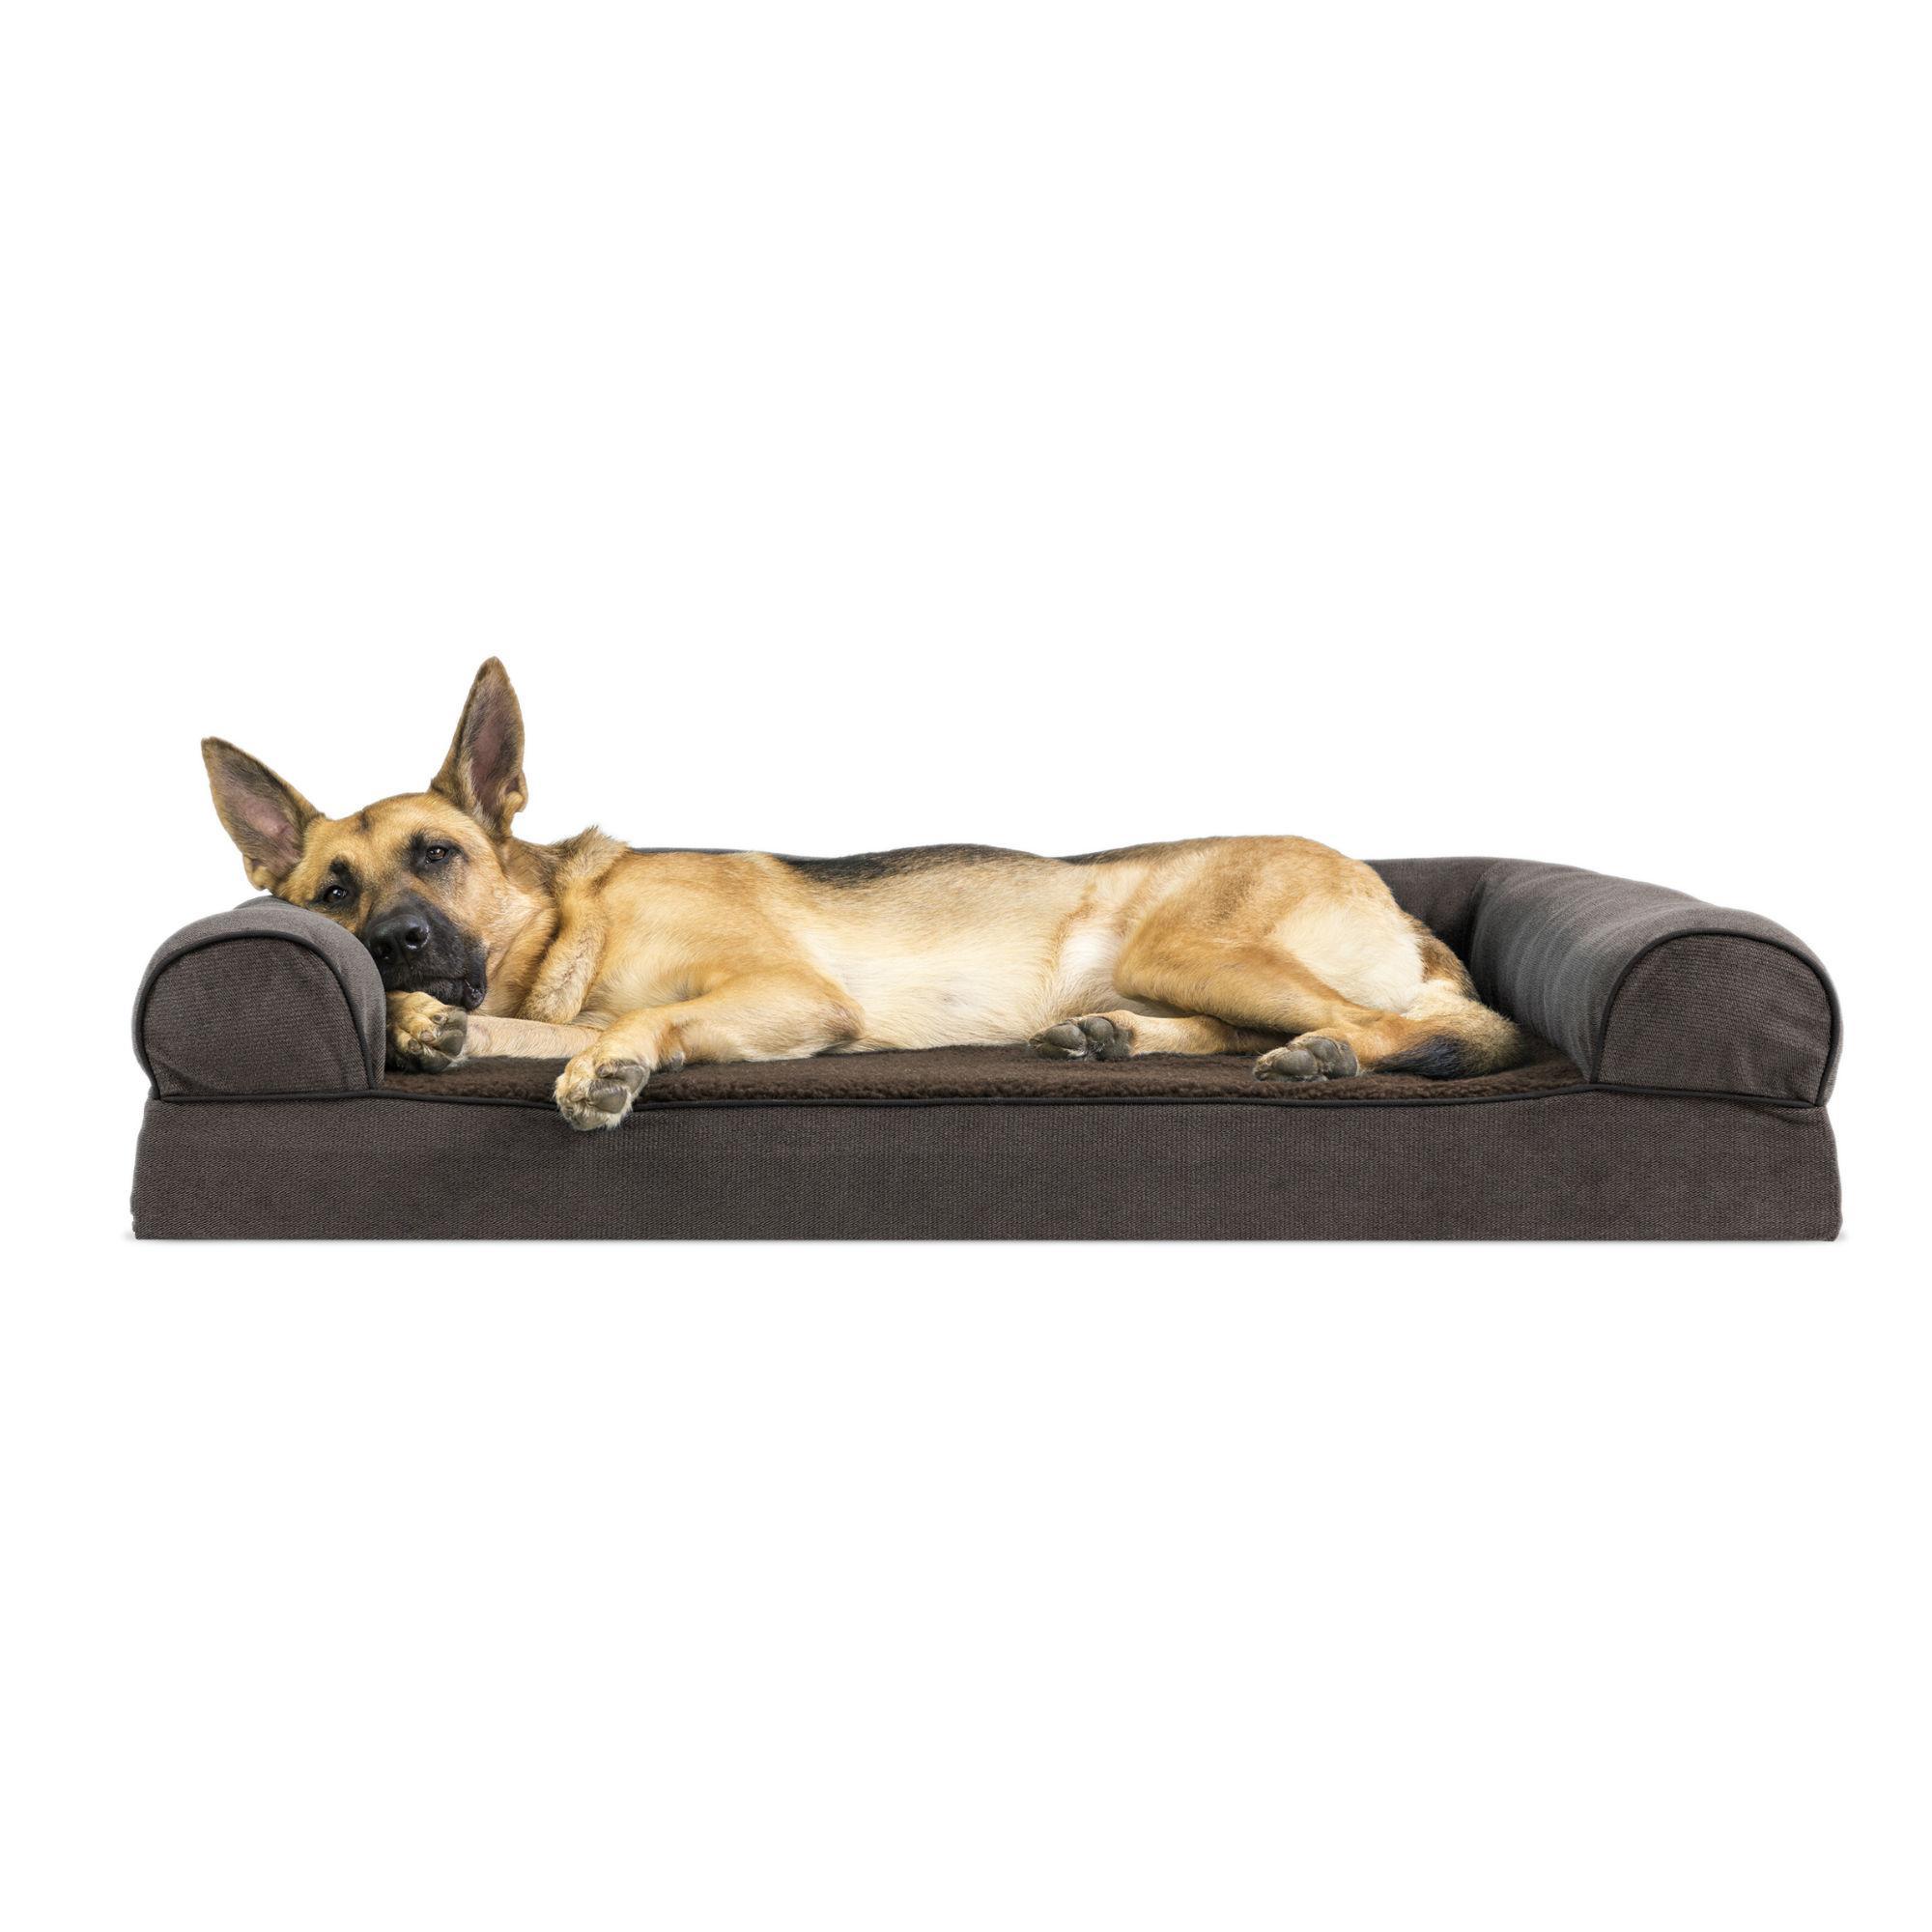 FurHaven Faux Fleece & Chenille Soft Woven Memory Top Sofa Pet Bed - Coffee